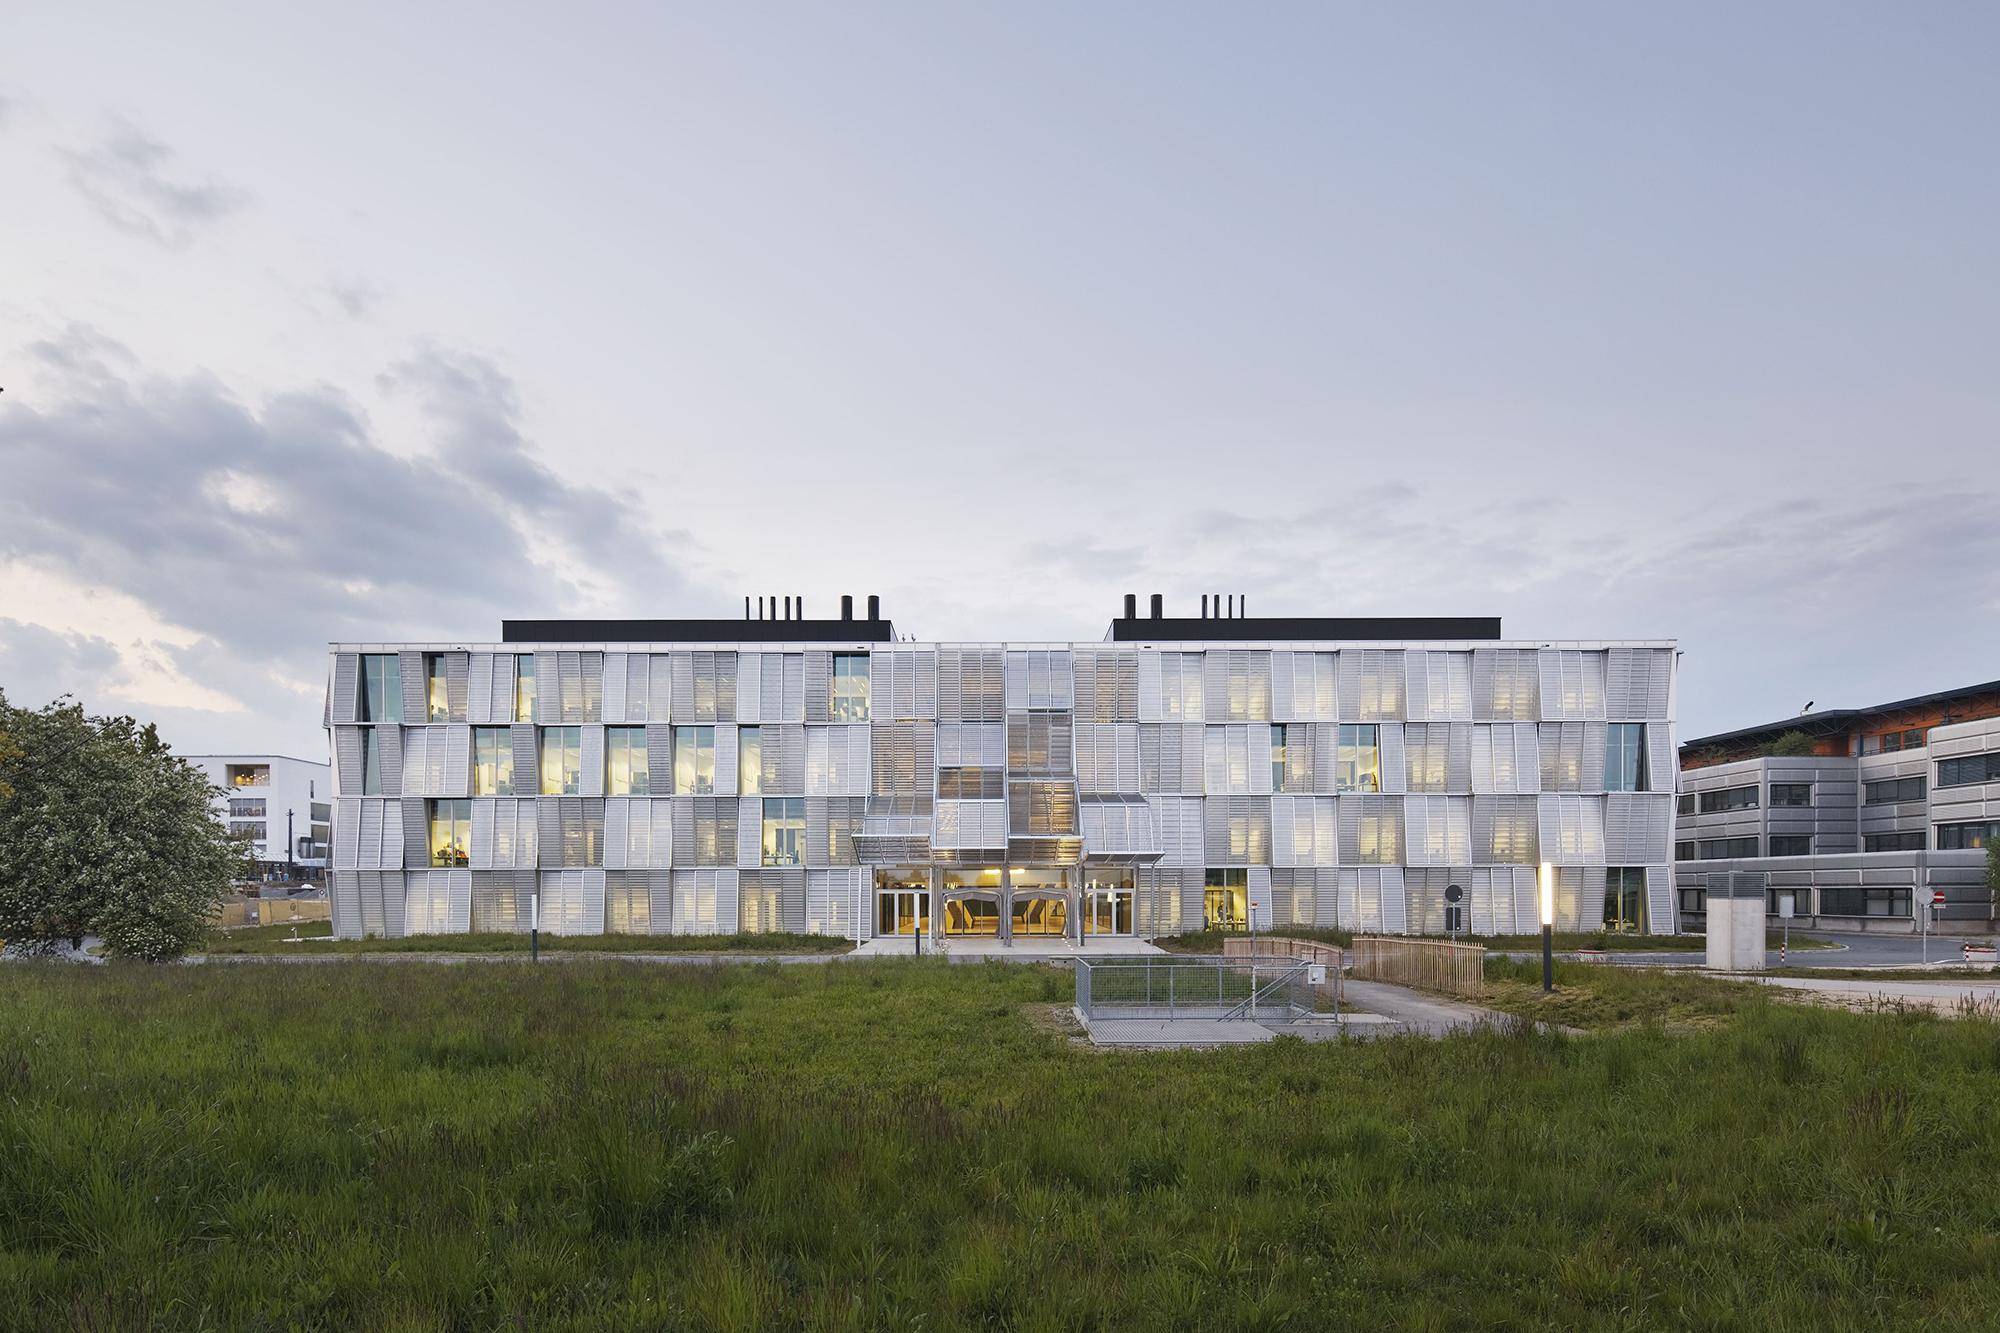 Mechanics hall architect magazine dominique perrault for Architecture suisse